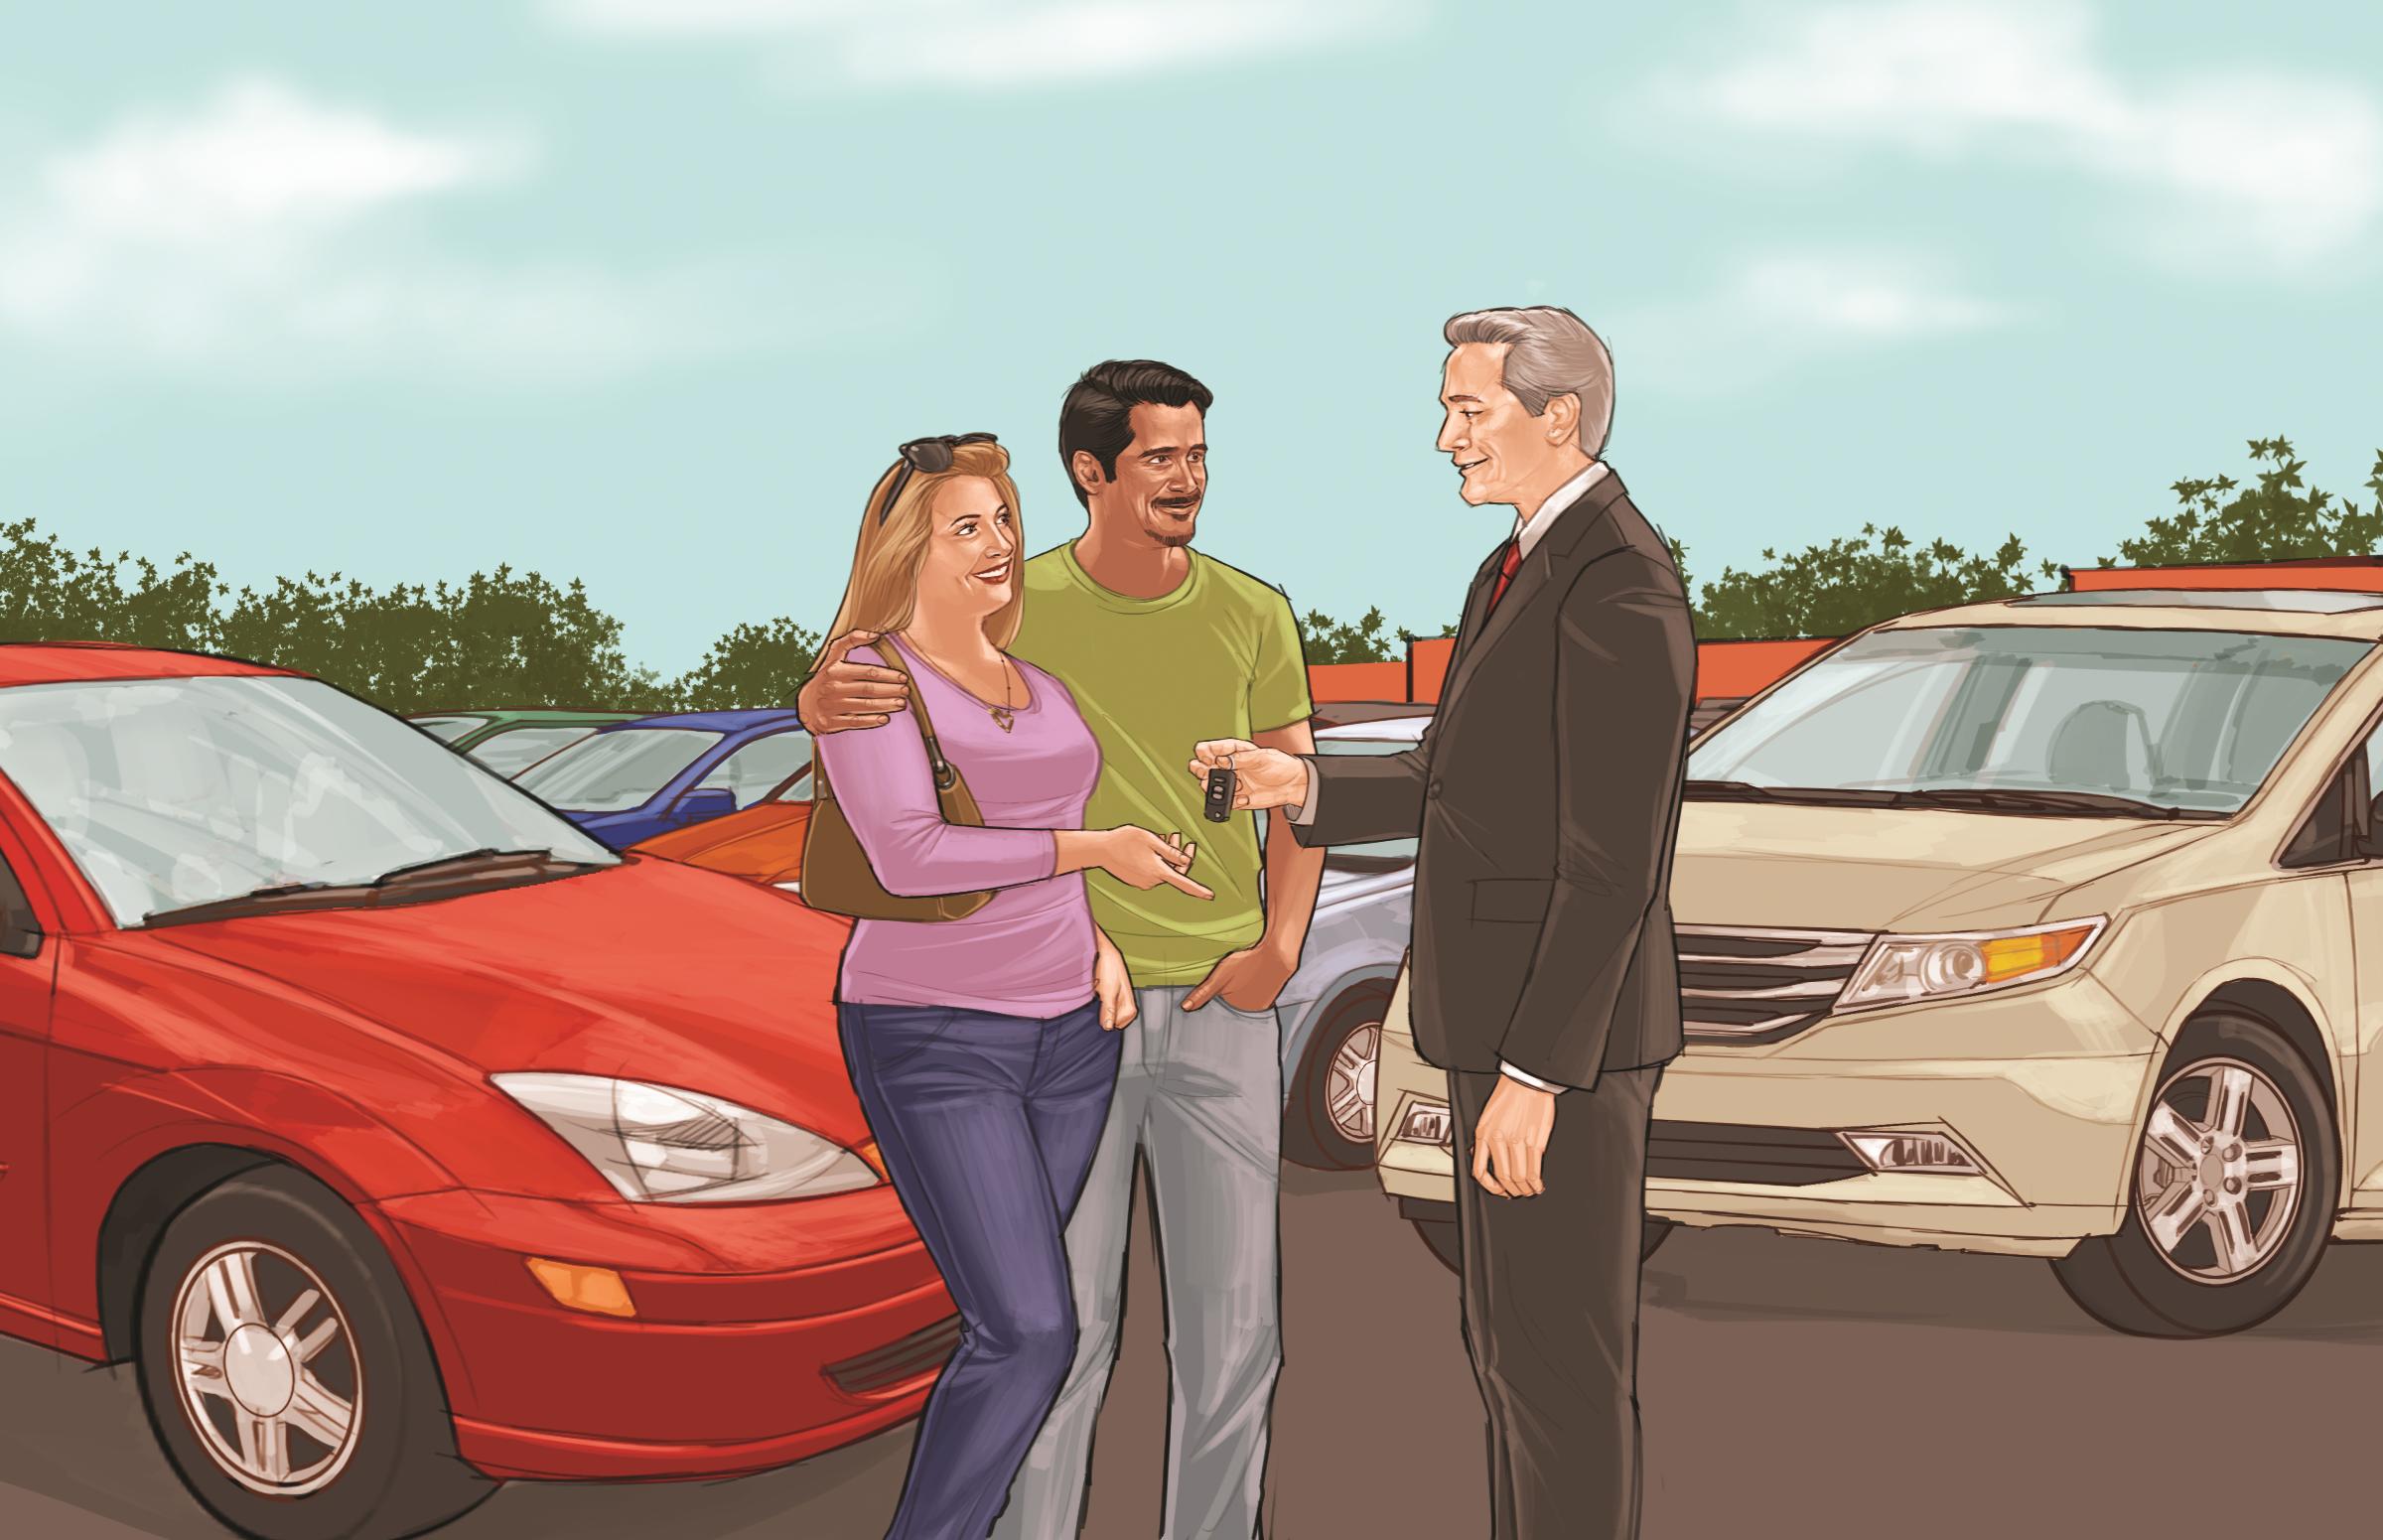 Manuel avoids car-buying trouble [fotonovela] | Consumer Information